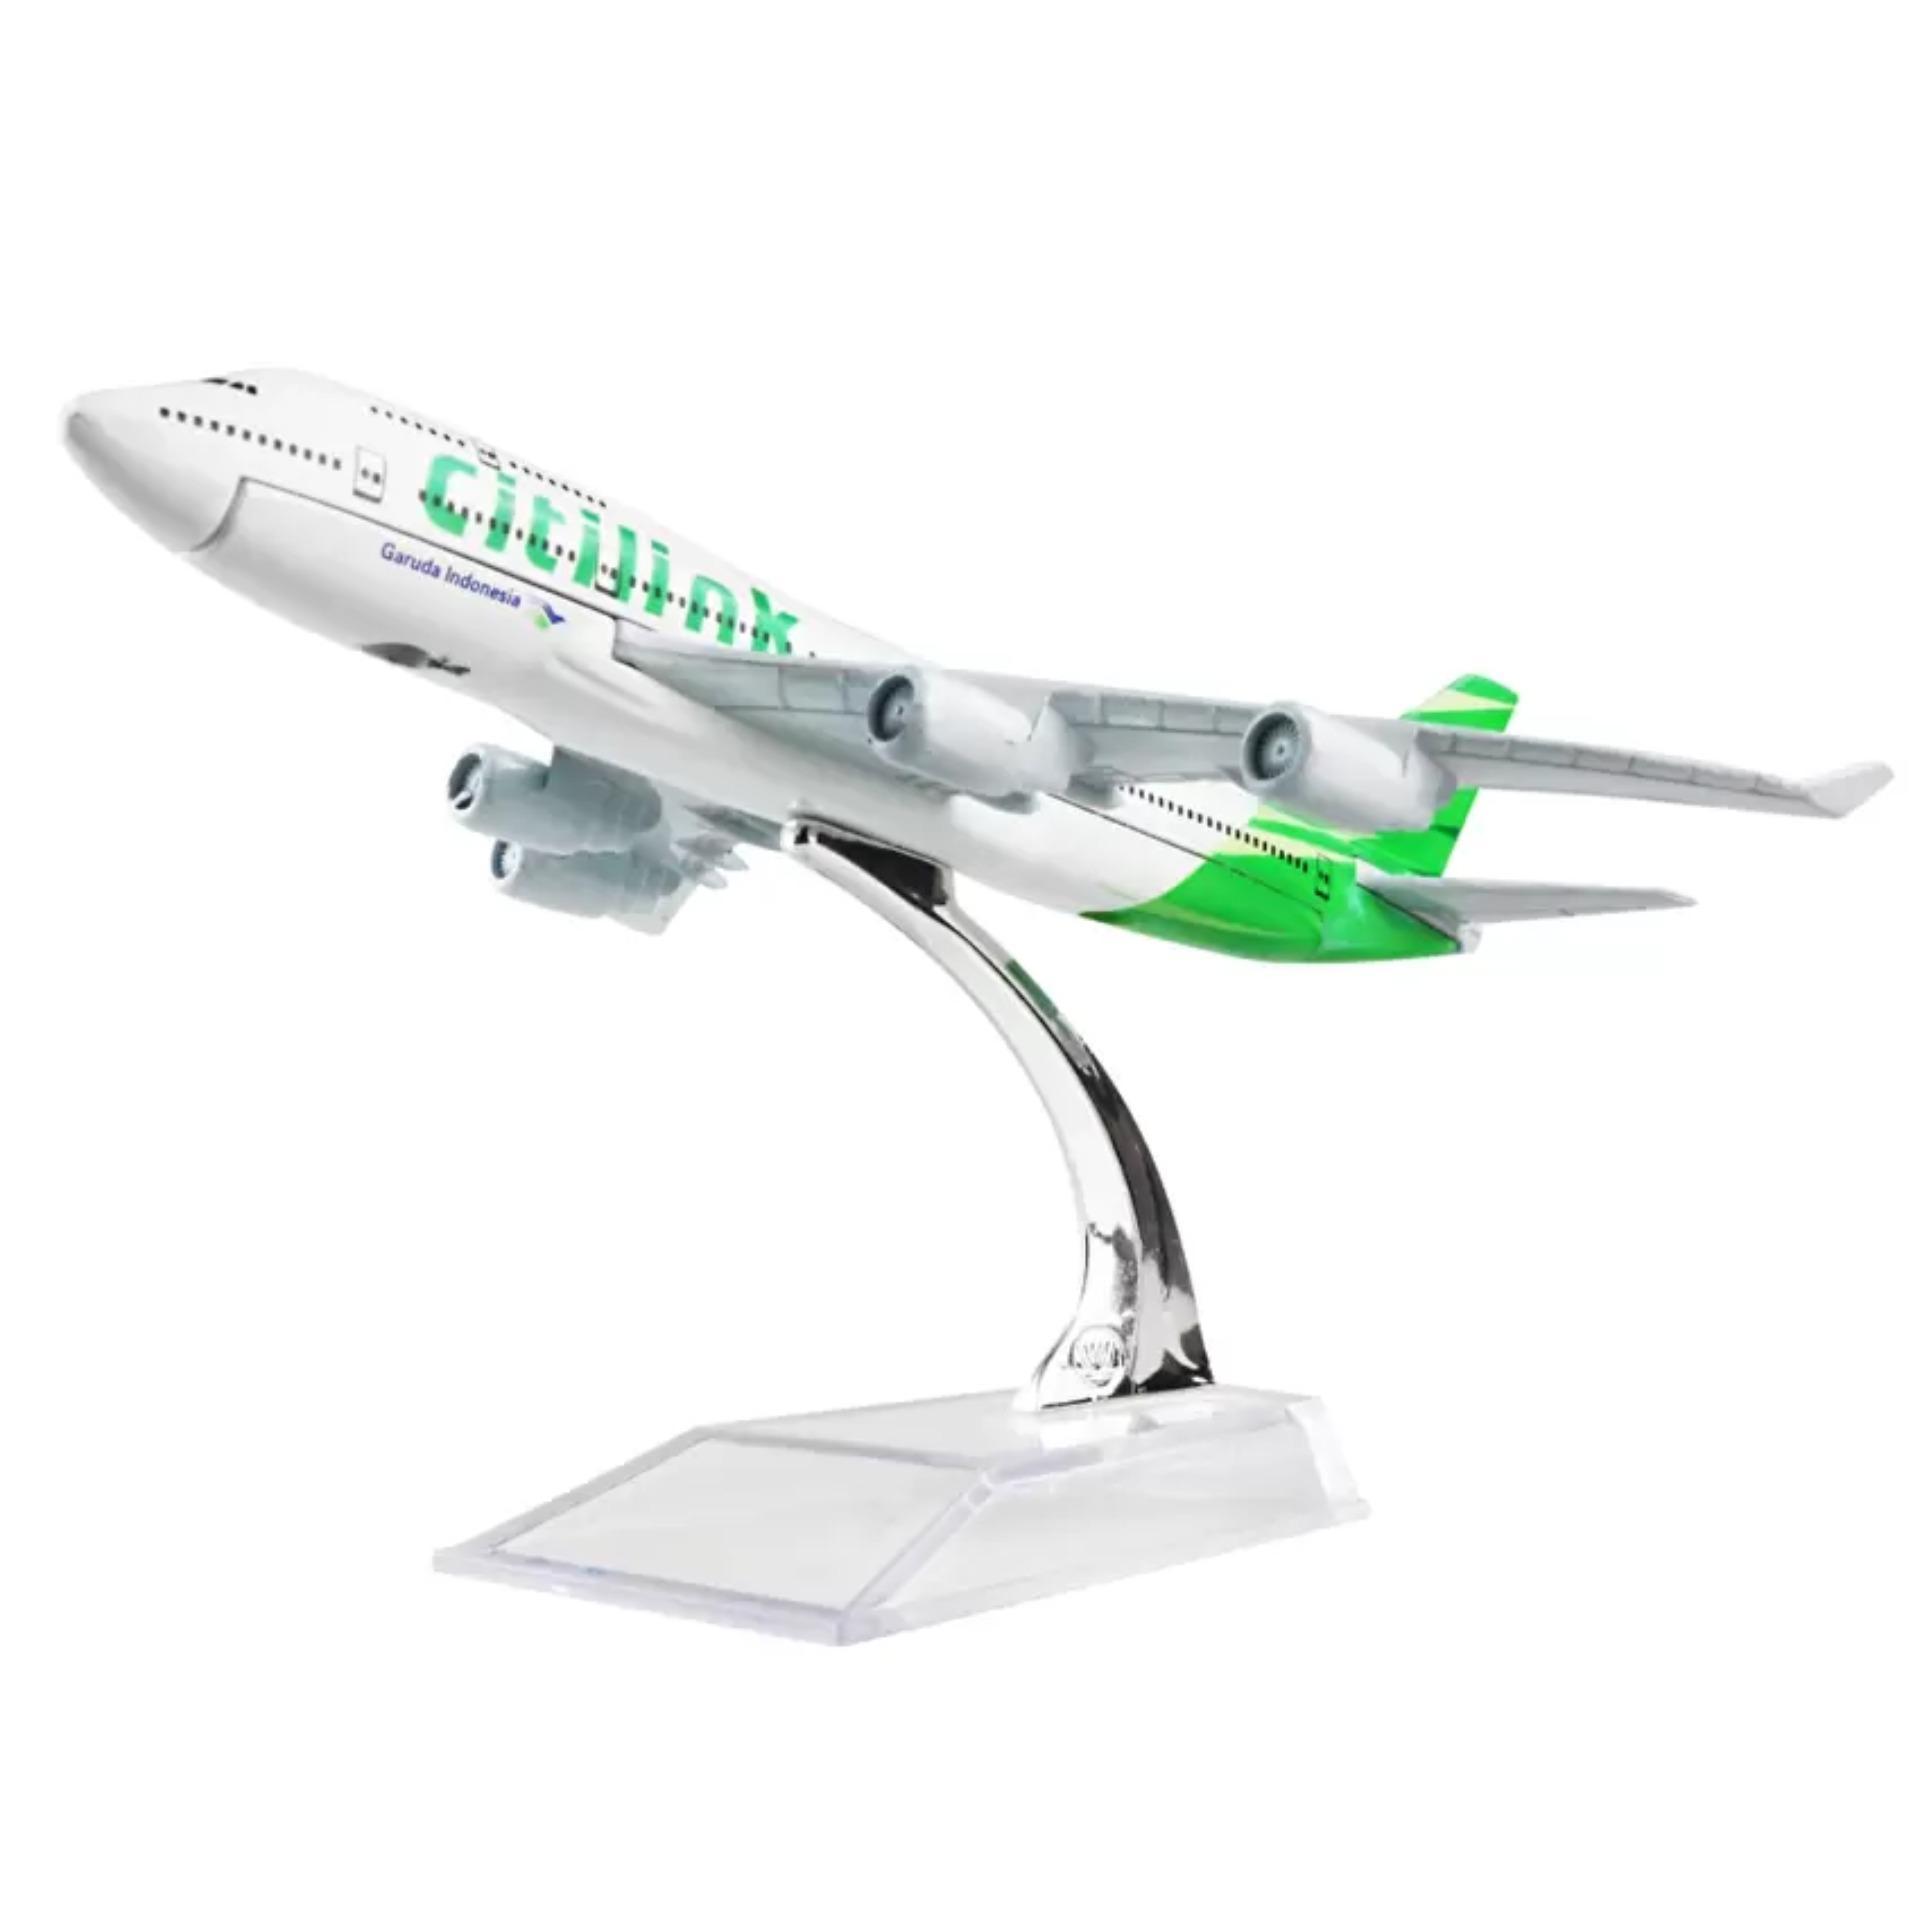 Jual Kenz Mainan Koleksi Anak Miniatur Pesawat Citilink Import